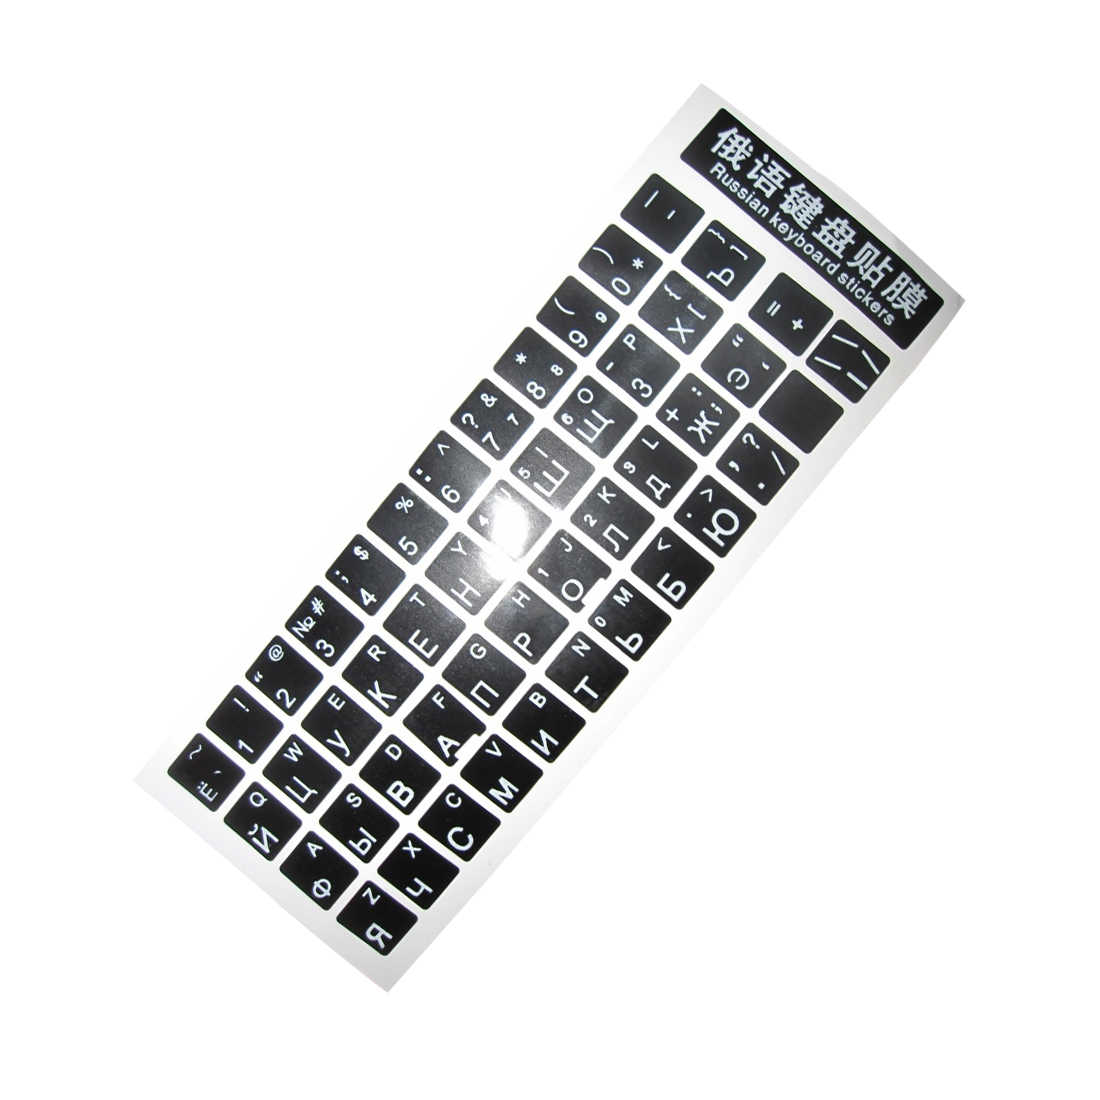 Etmakit Top Kualitas Rusia stiker keyboard keycap untuk Mekanik keyboard notebook Komputer Desktop Laptop Rusia